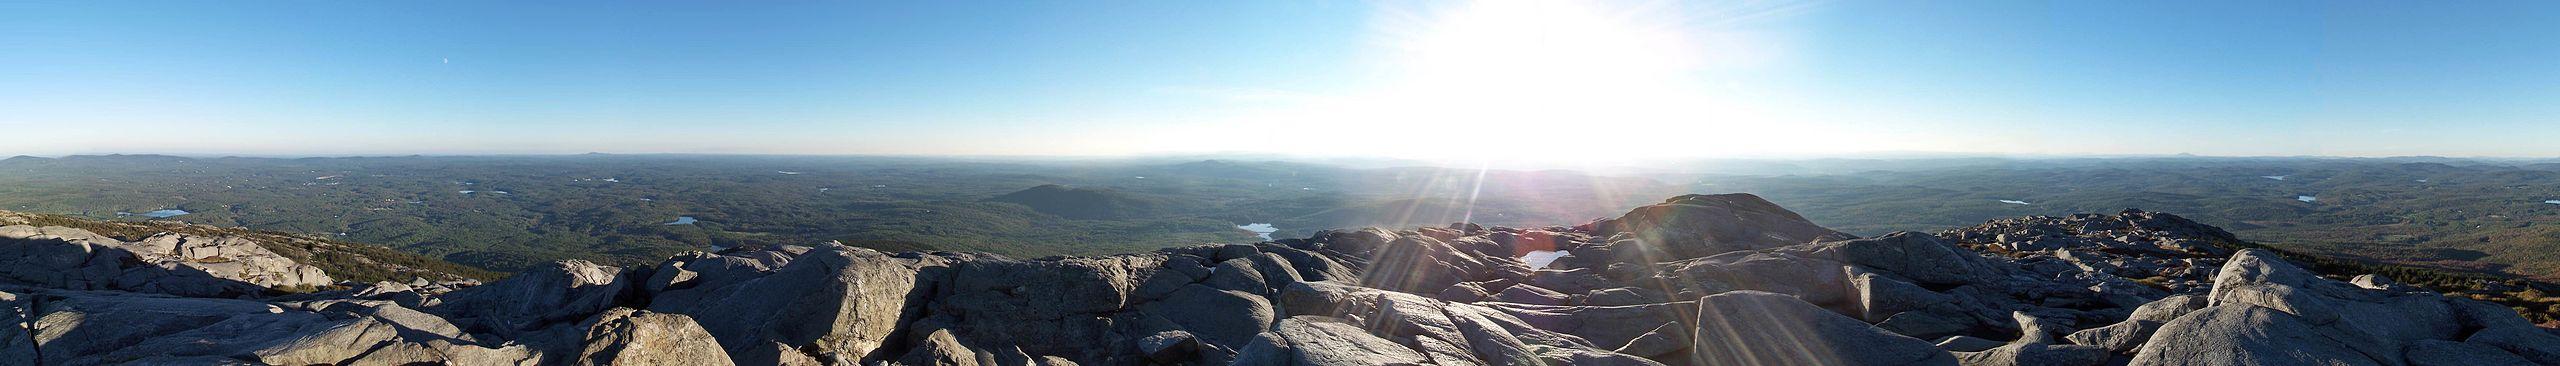 monadnock region travel guide at wikivoyage